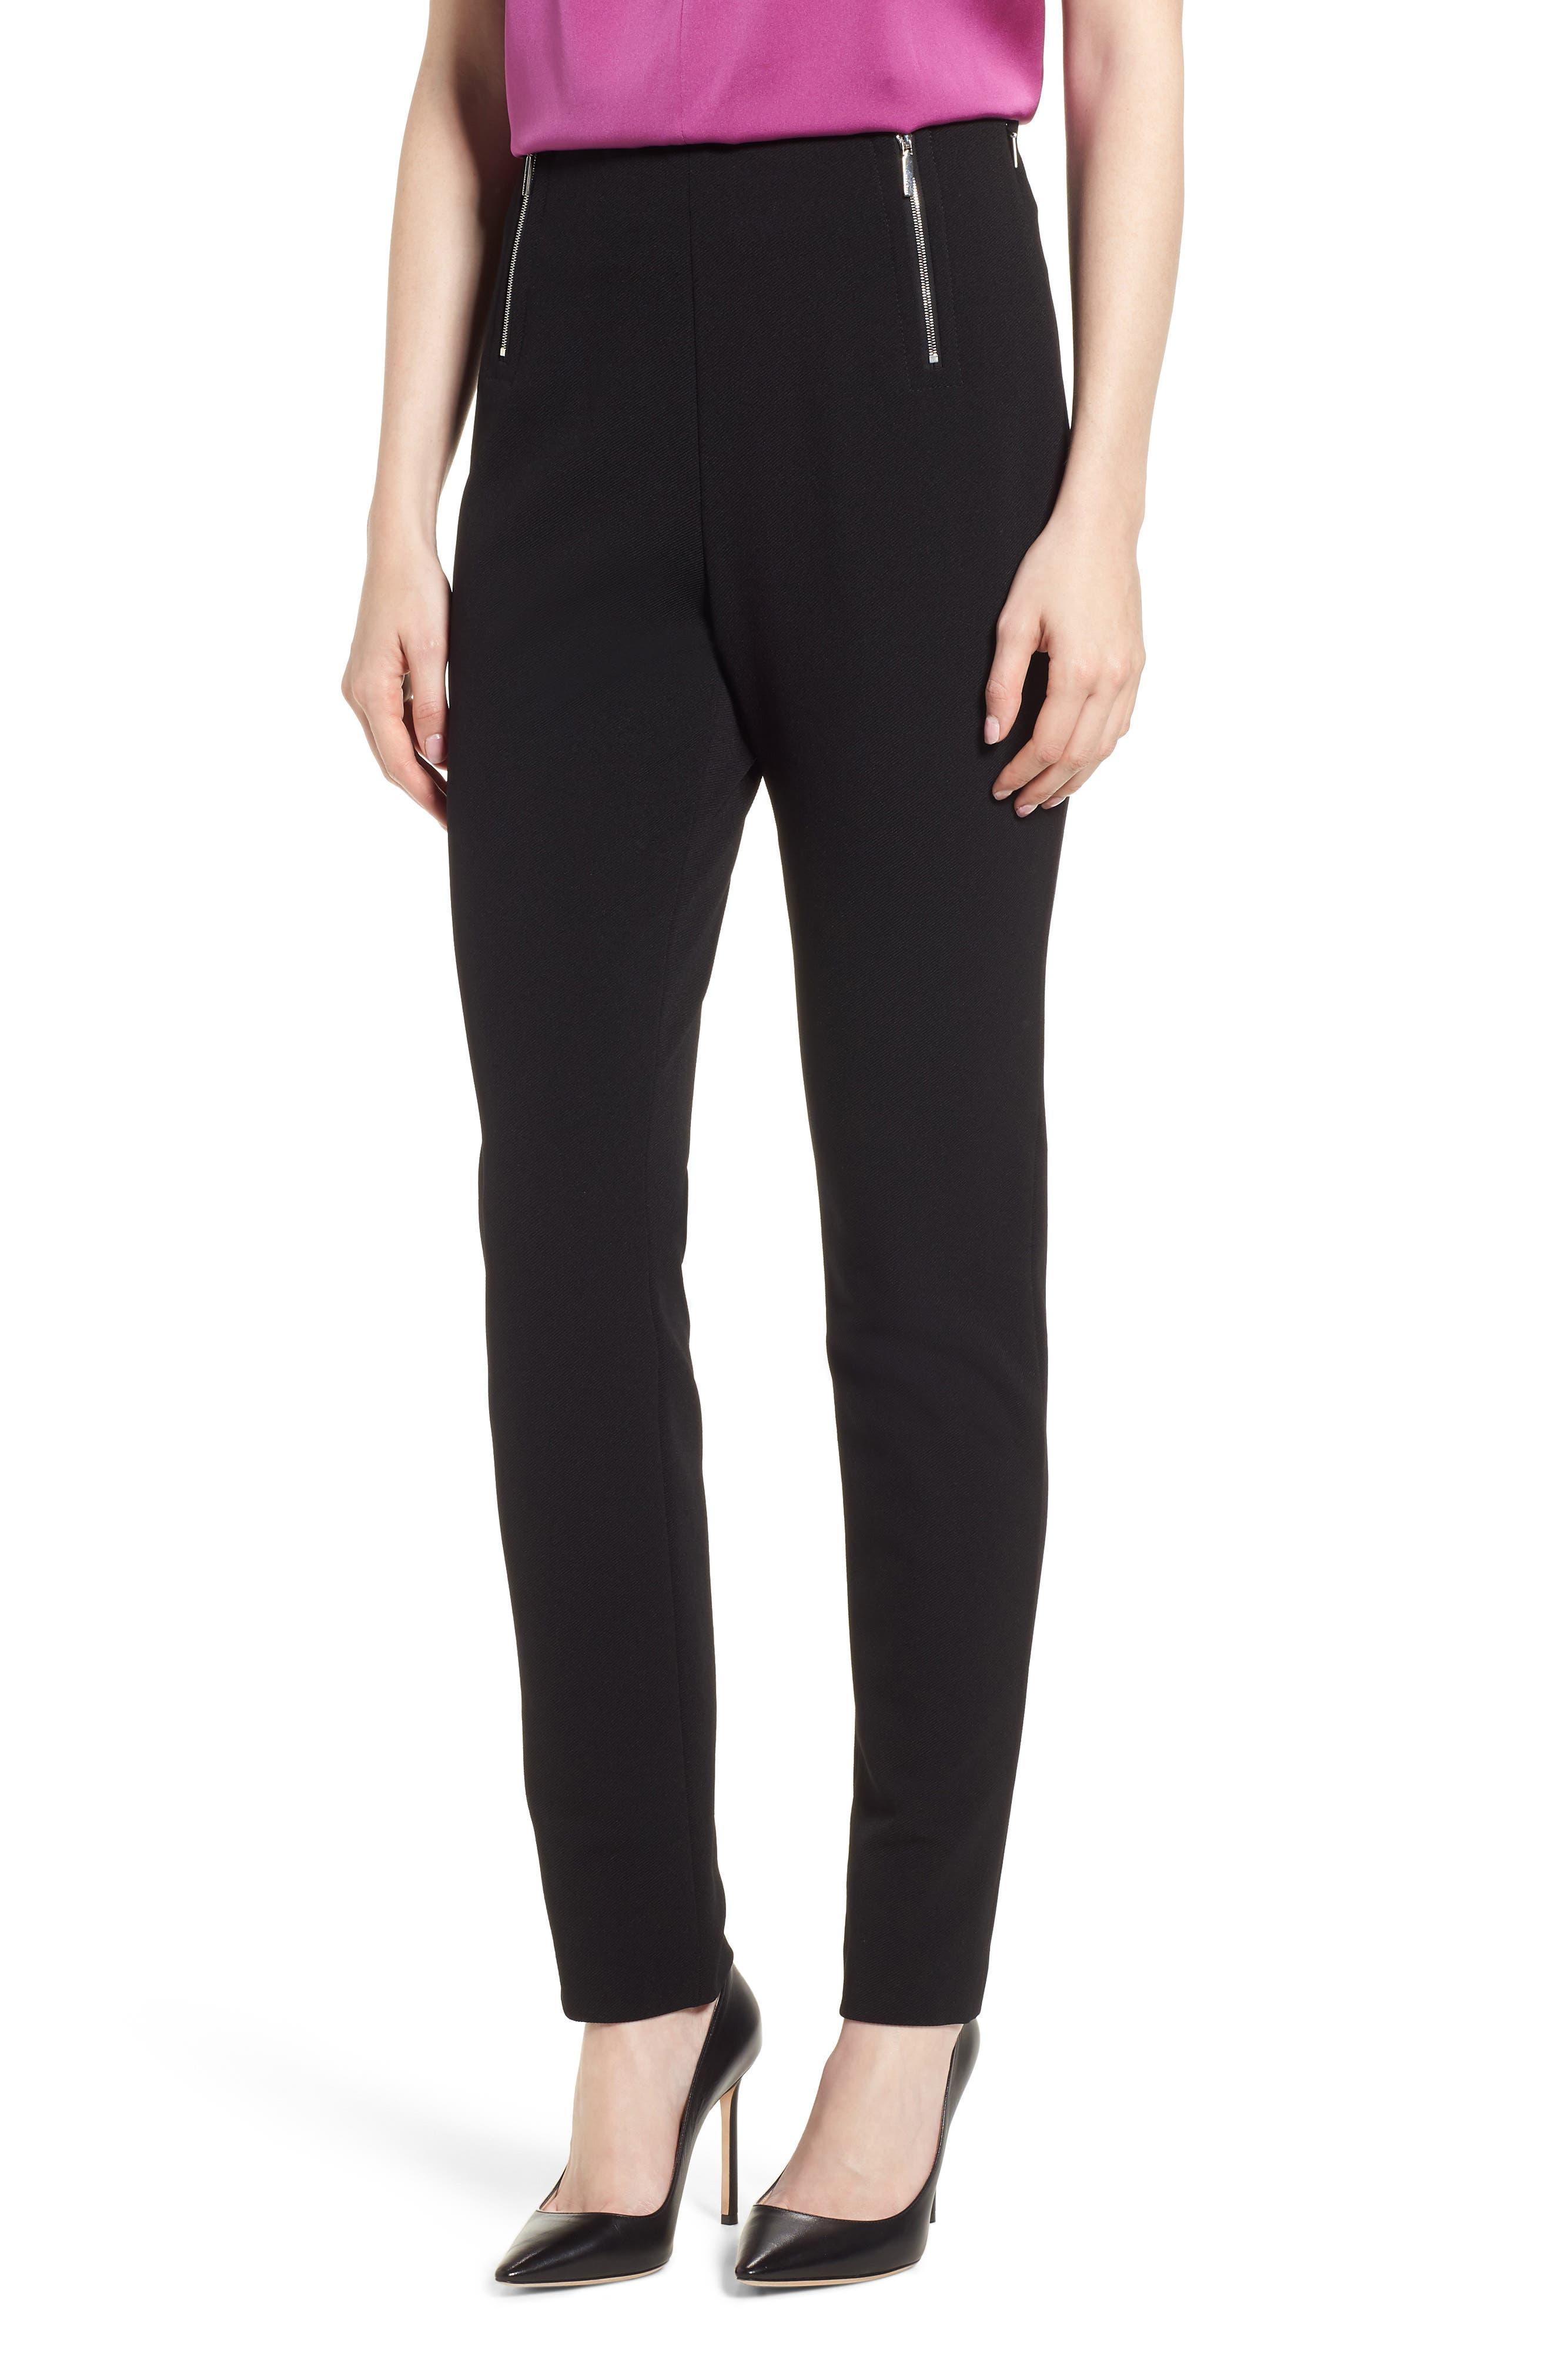 Tilezea Twill Jersey Trousers,                         Main,                         color, Black